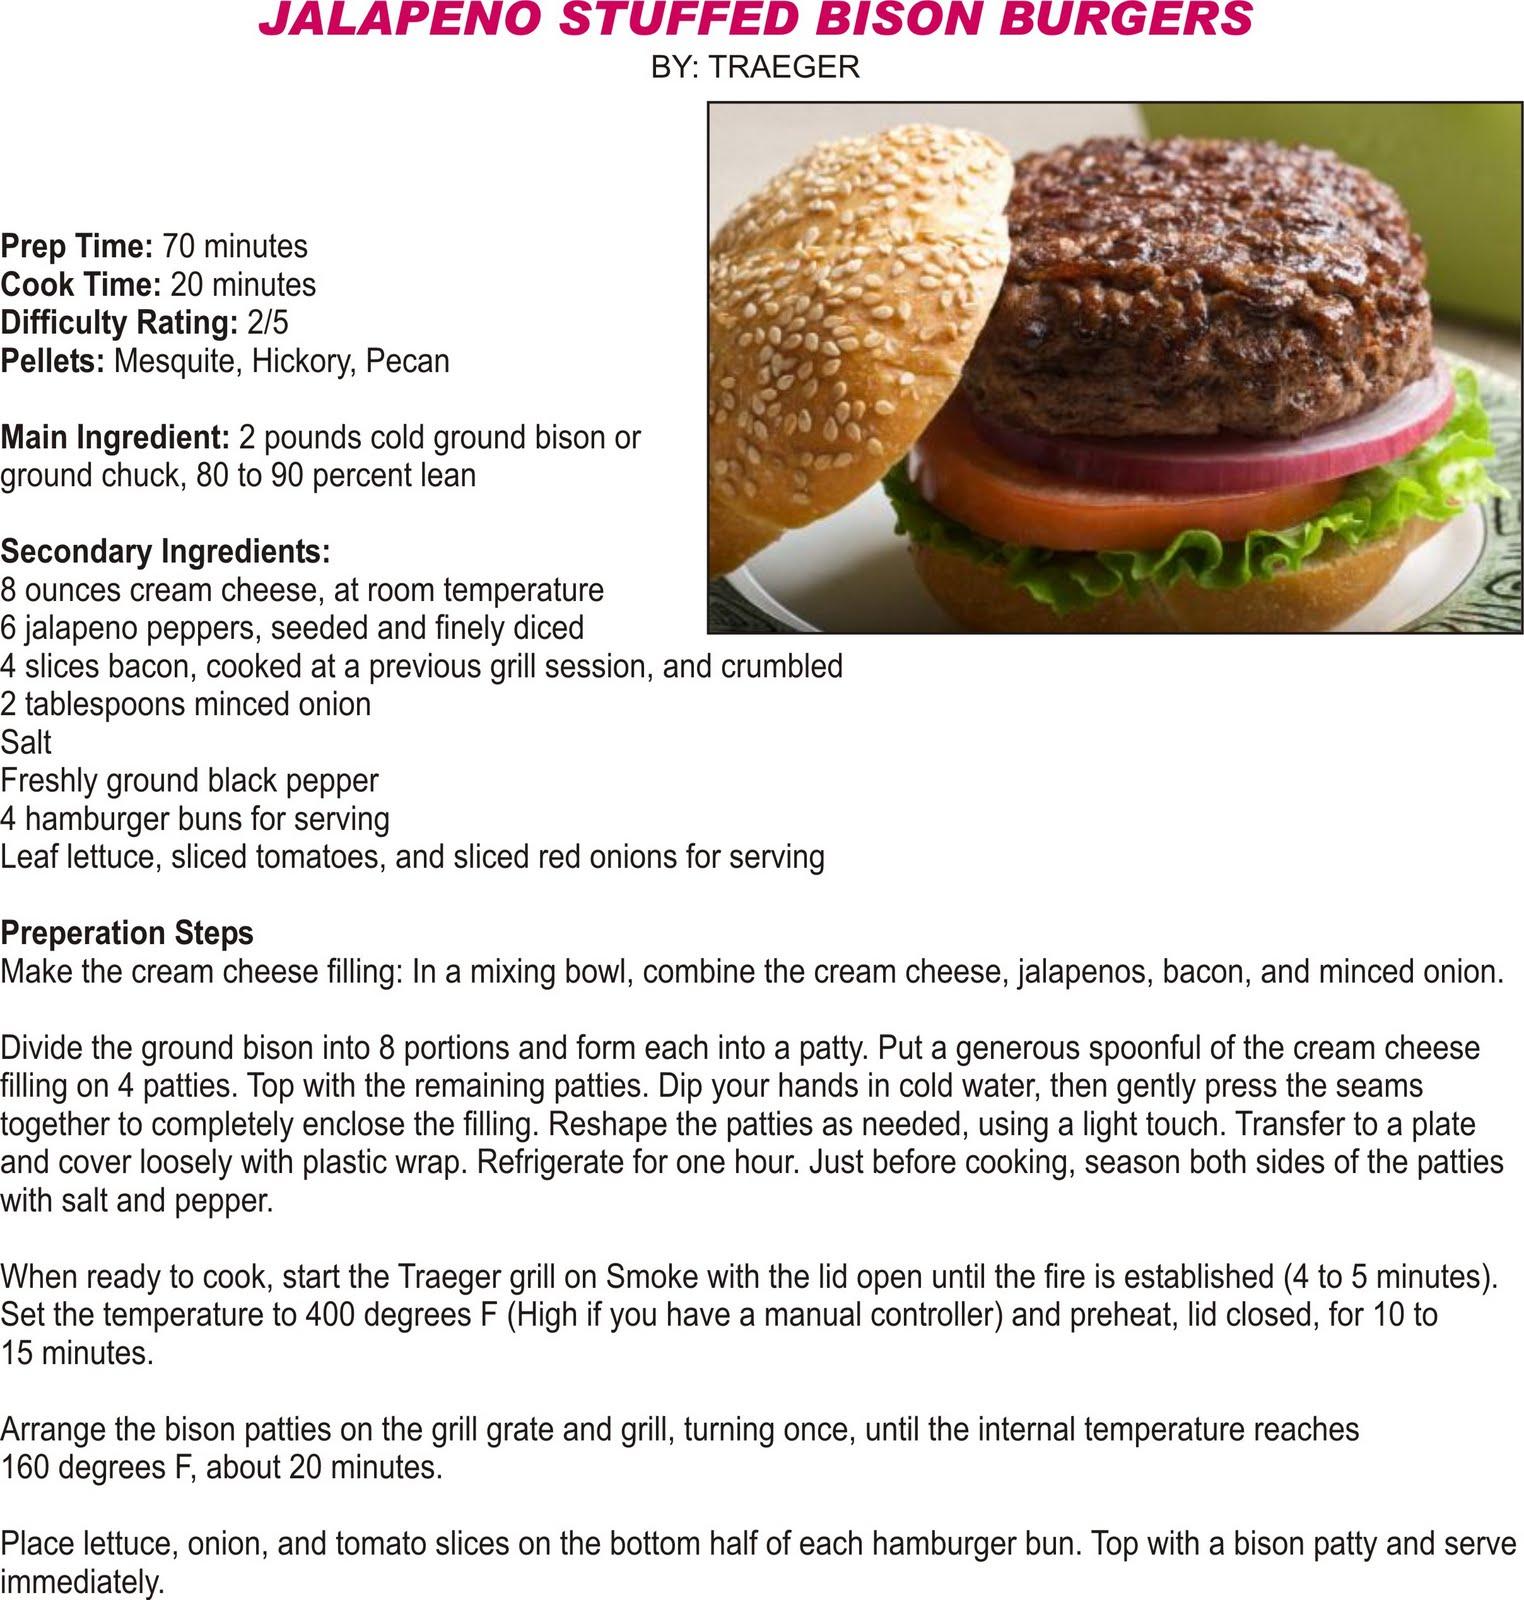 Traeger Grills: Jalapeno Stuffed Bison Burgers